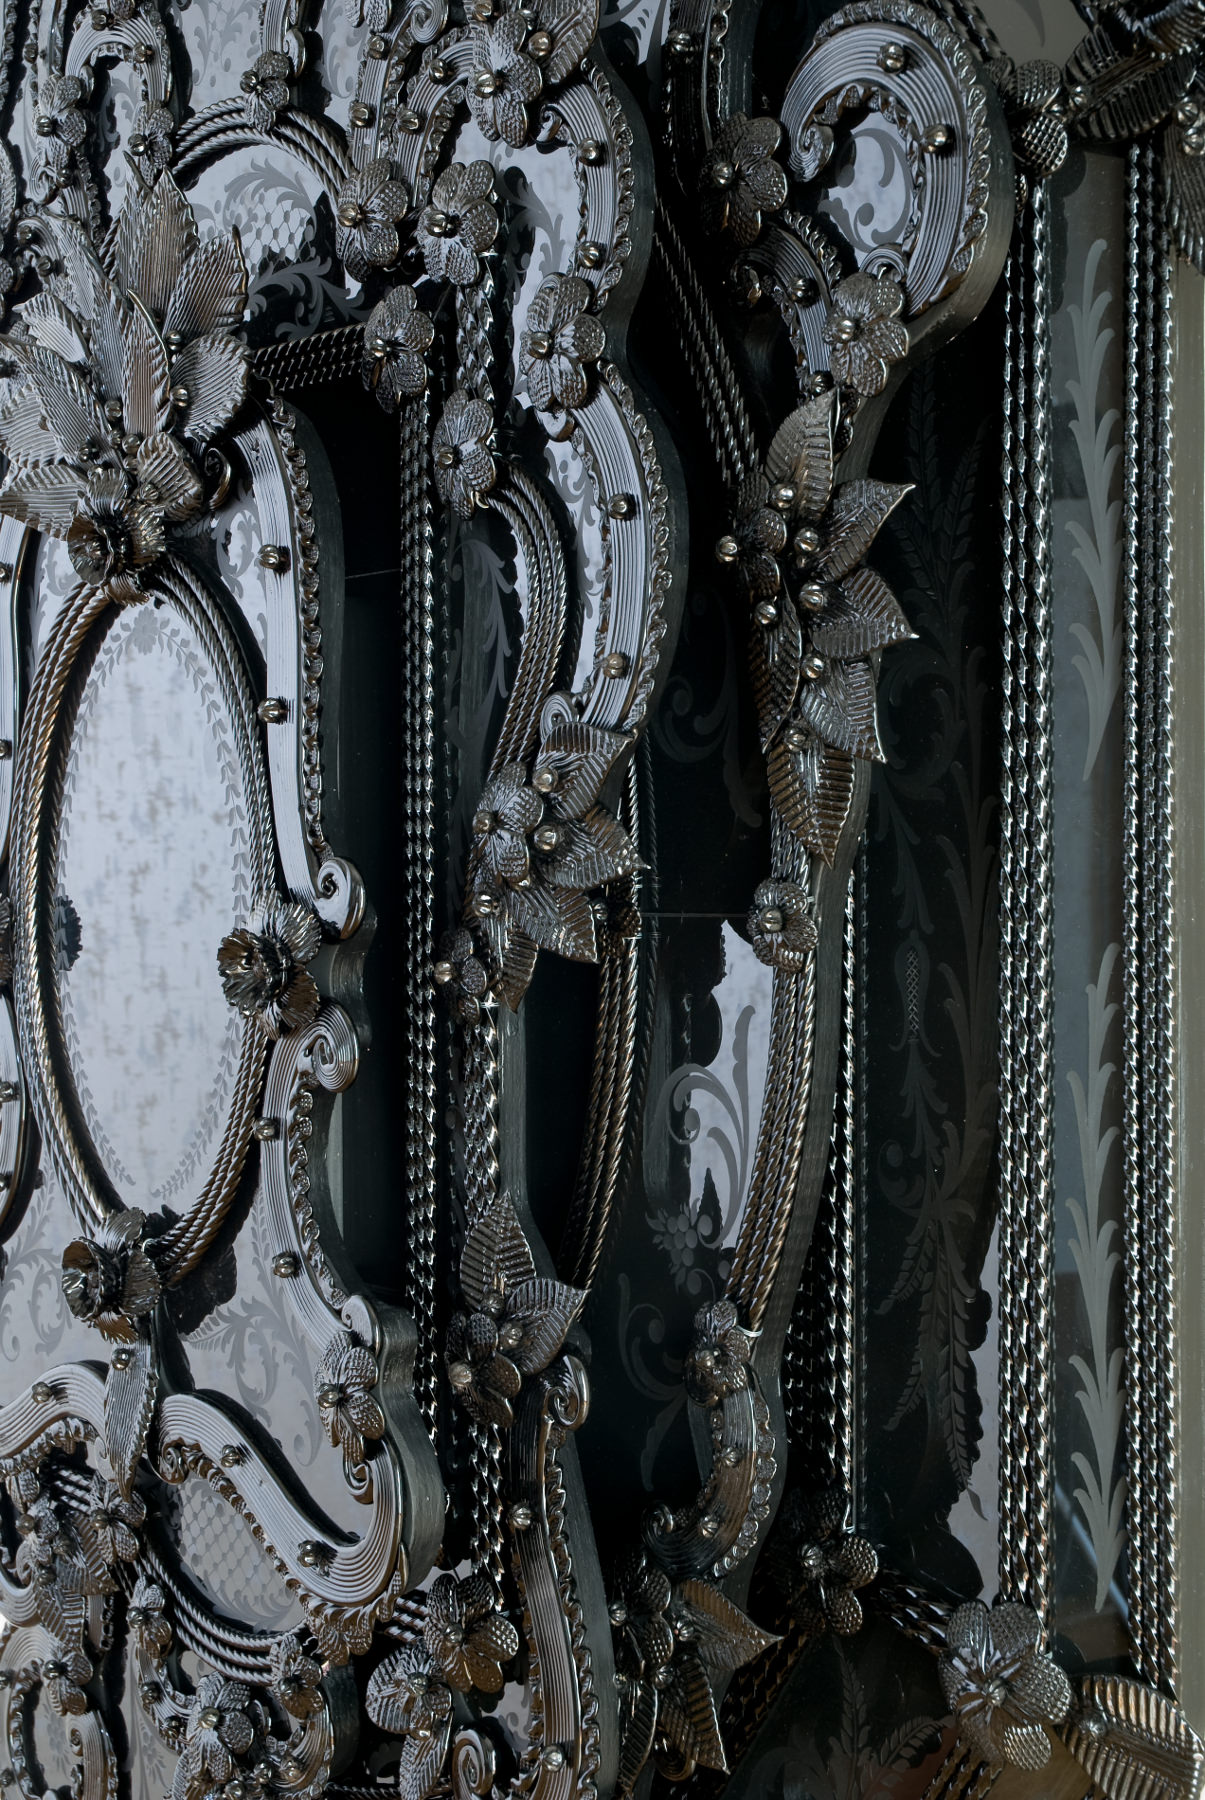 Fred Wilson - Iagos mirror